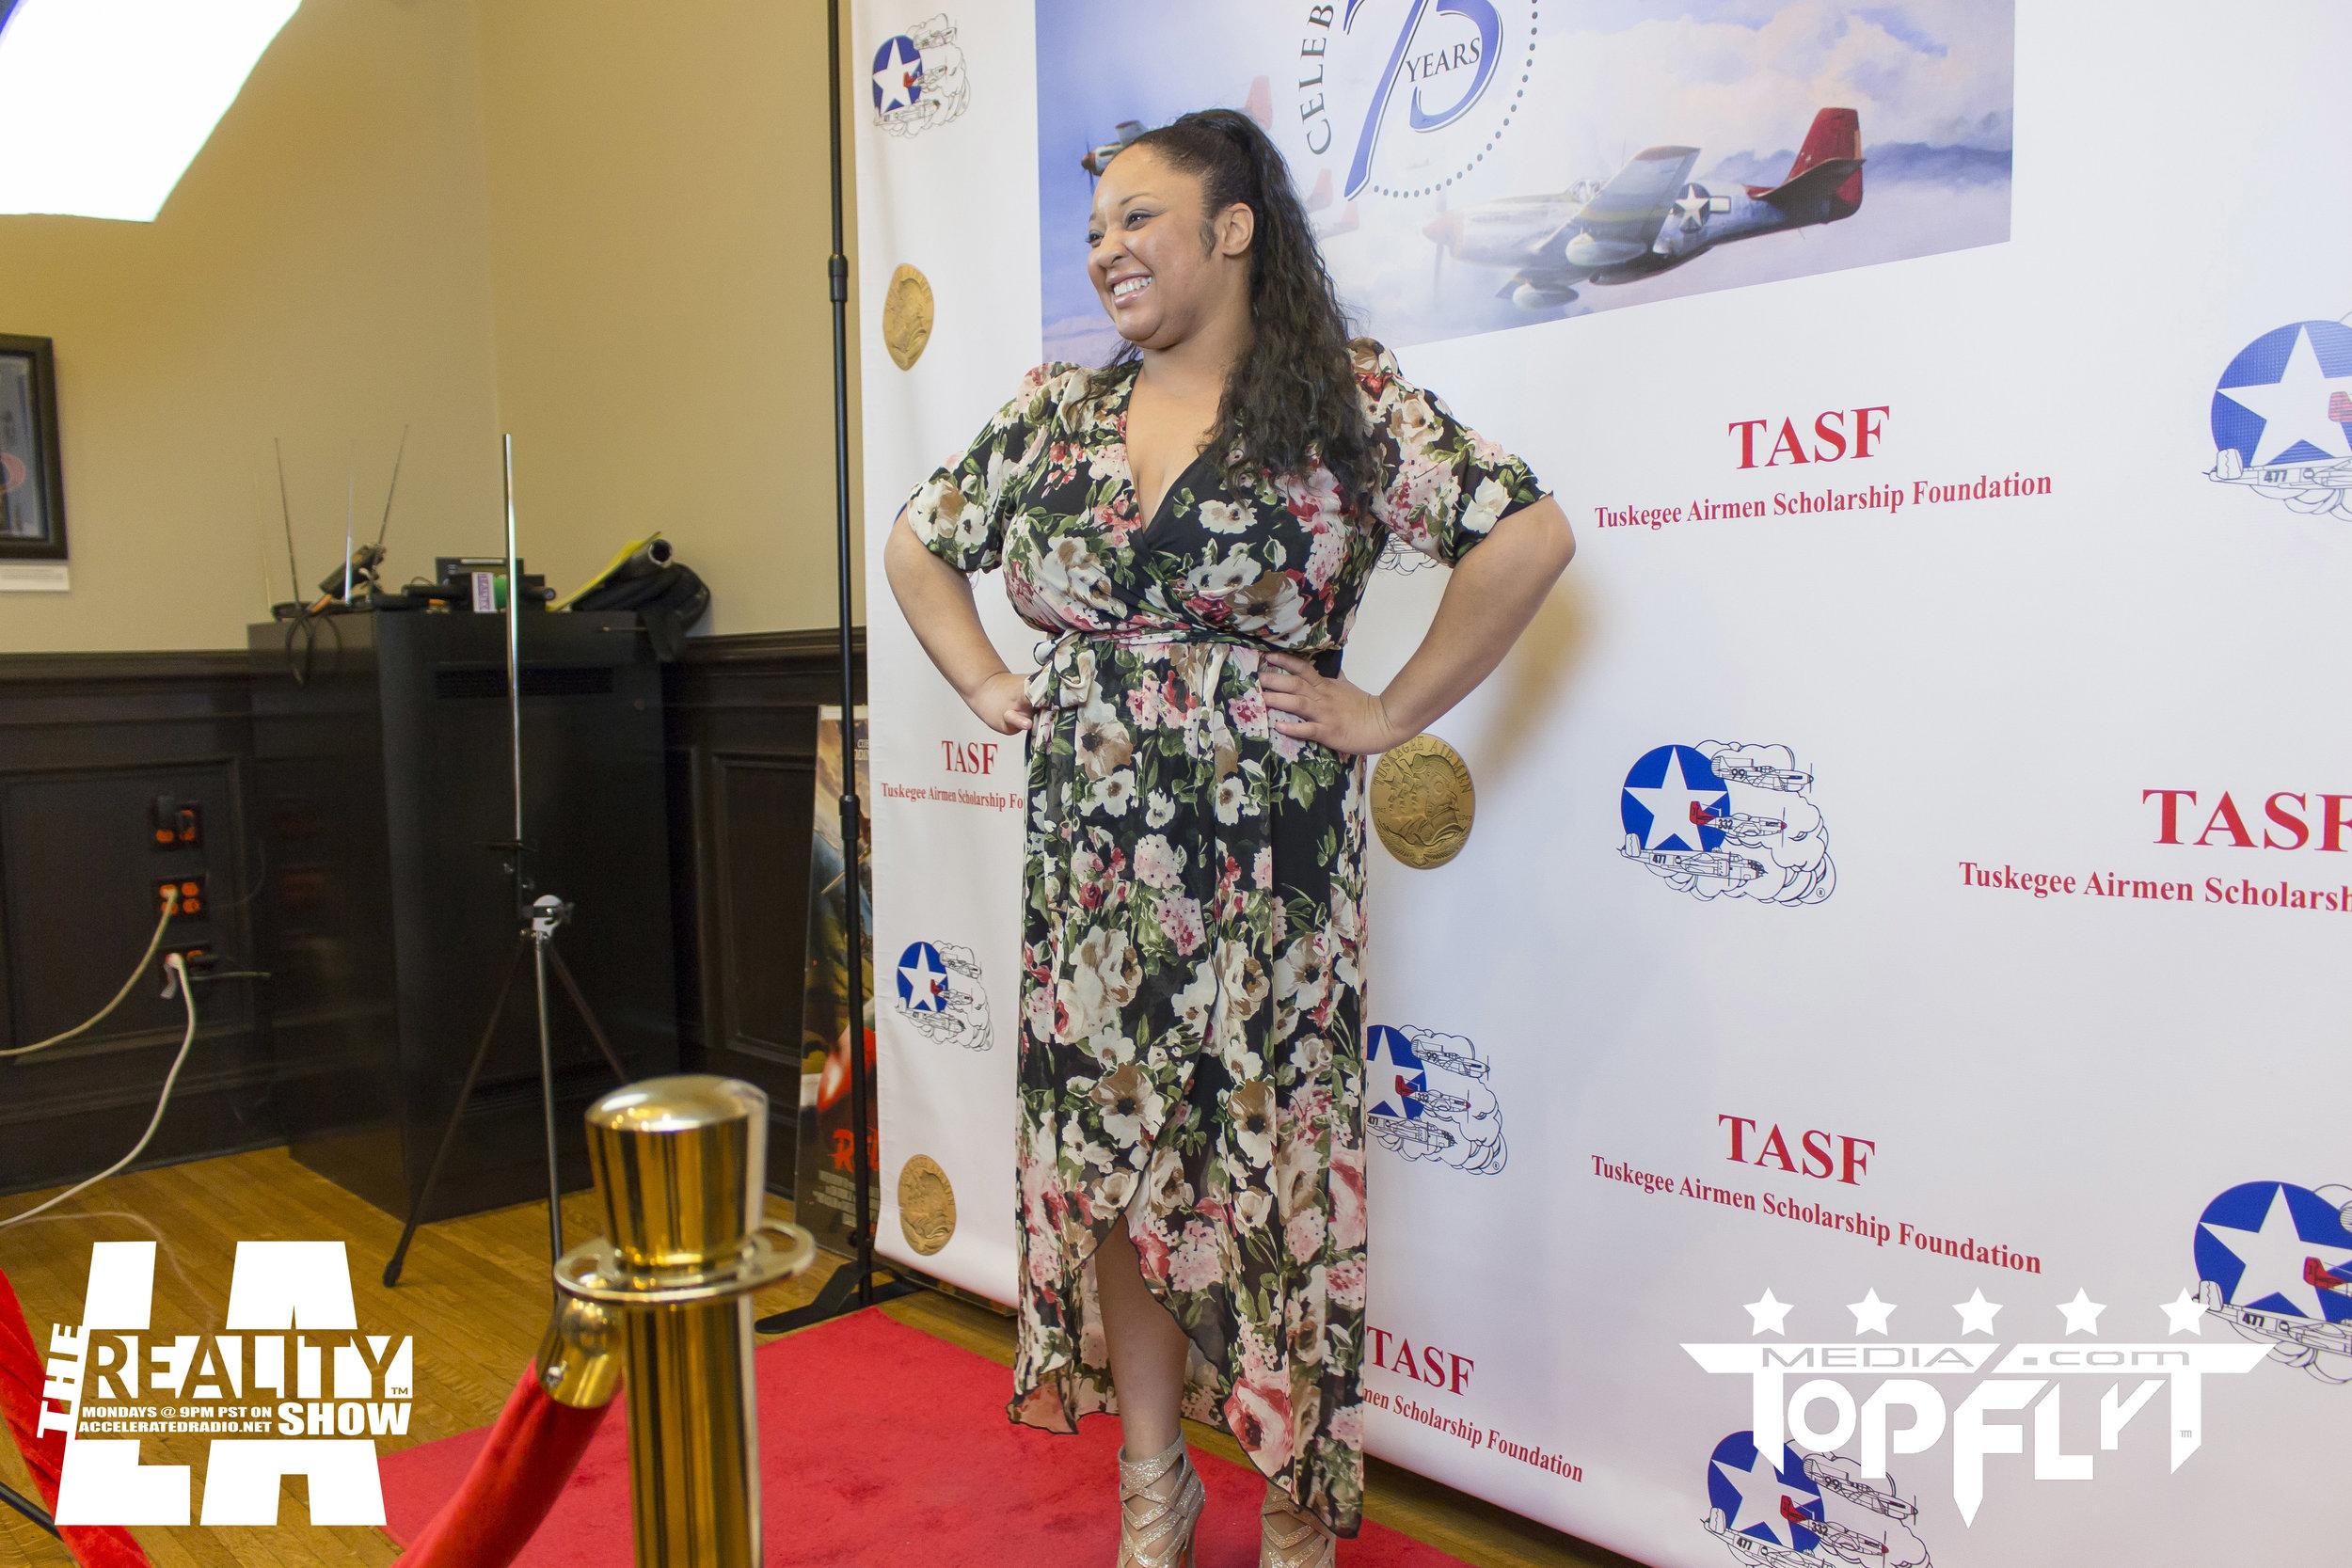 The Reality Show LA - Tuskegee Airmen 75th Anniversary VIP Reception_114.jpg